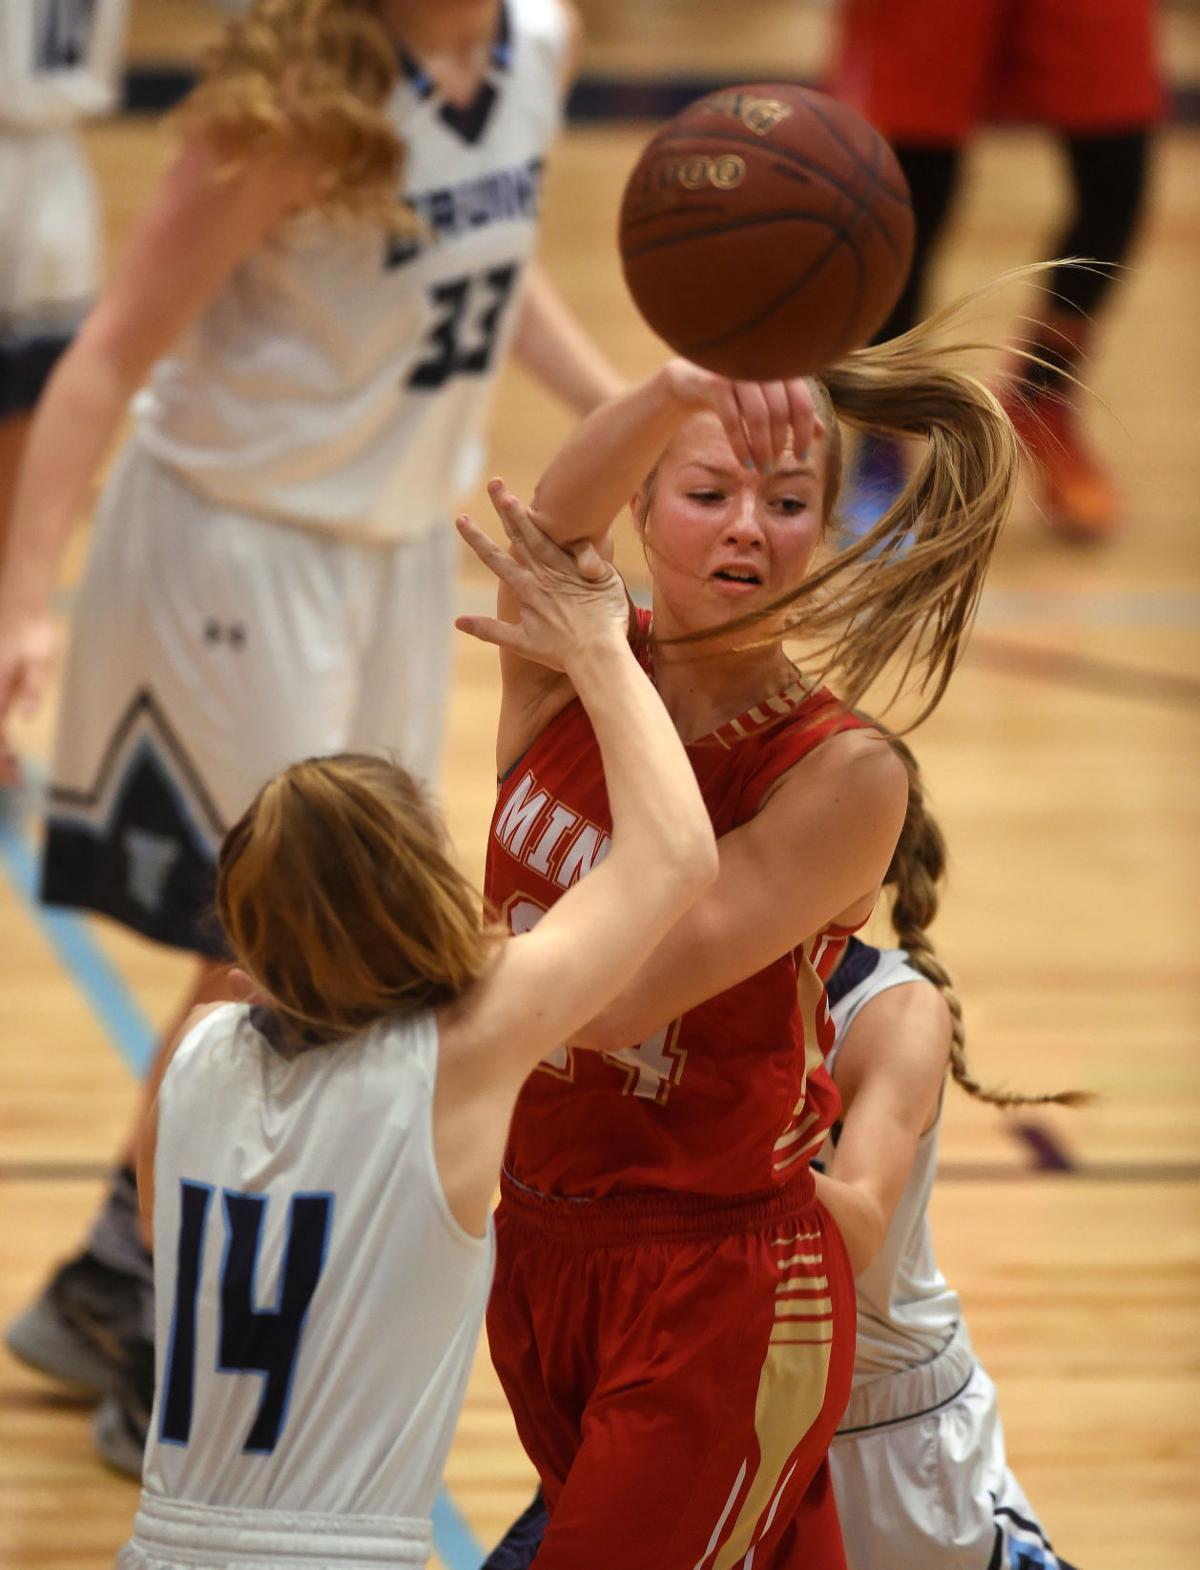 Girls Basketball - Minico Vs. Twin Falls